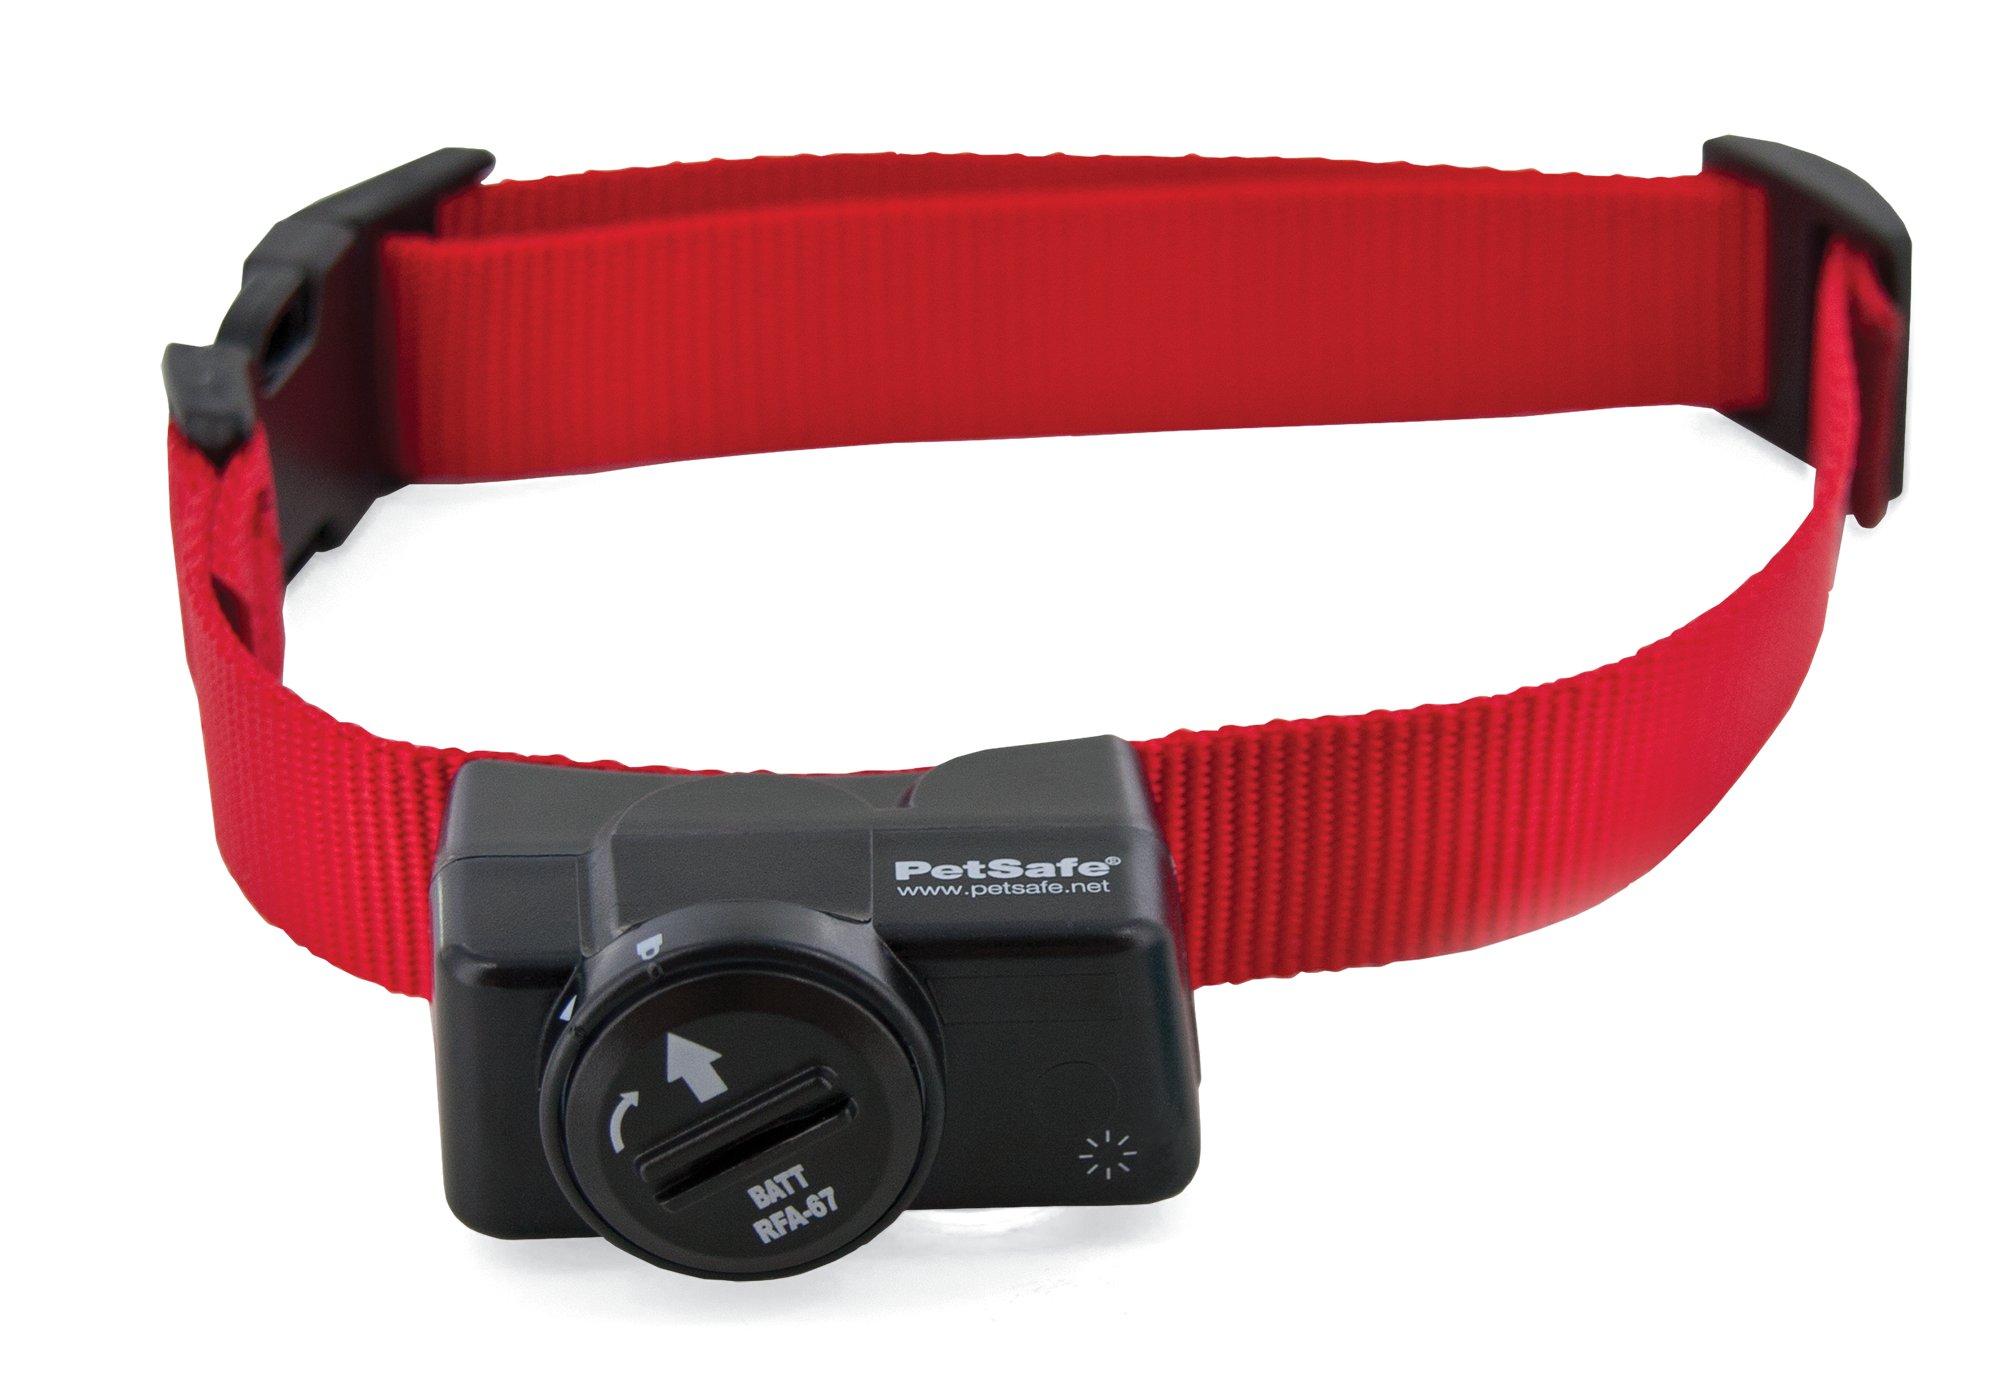 PetSafe Extra Wireless Receiver Collar